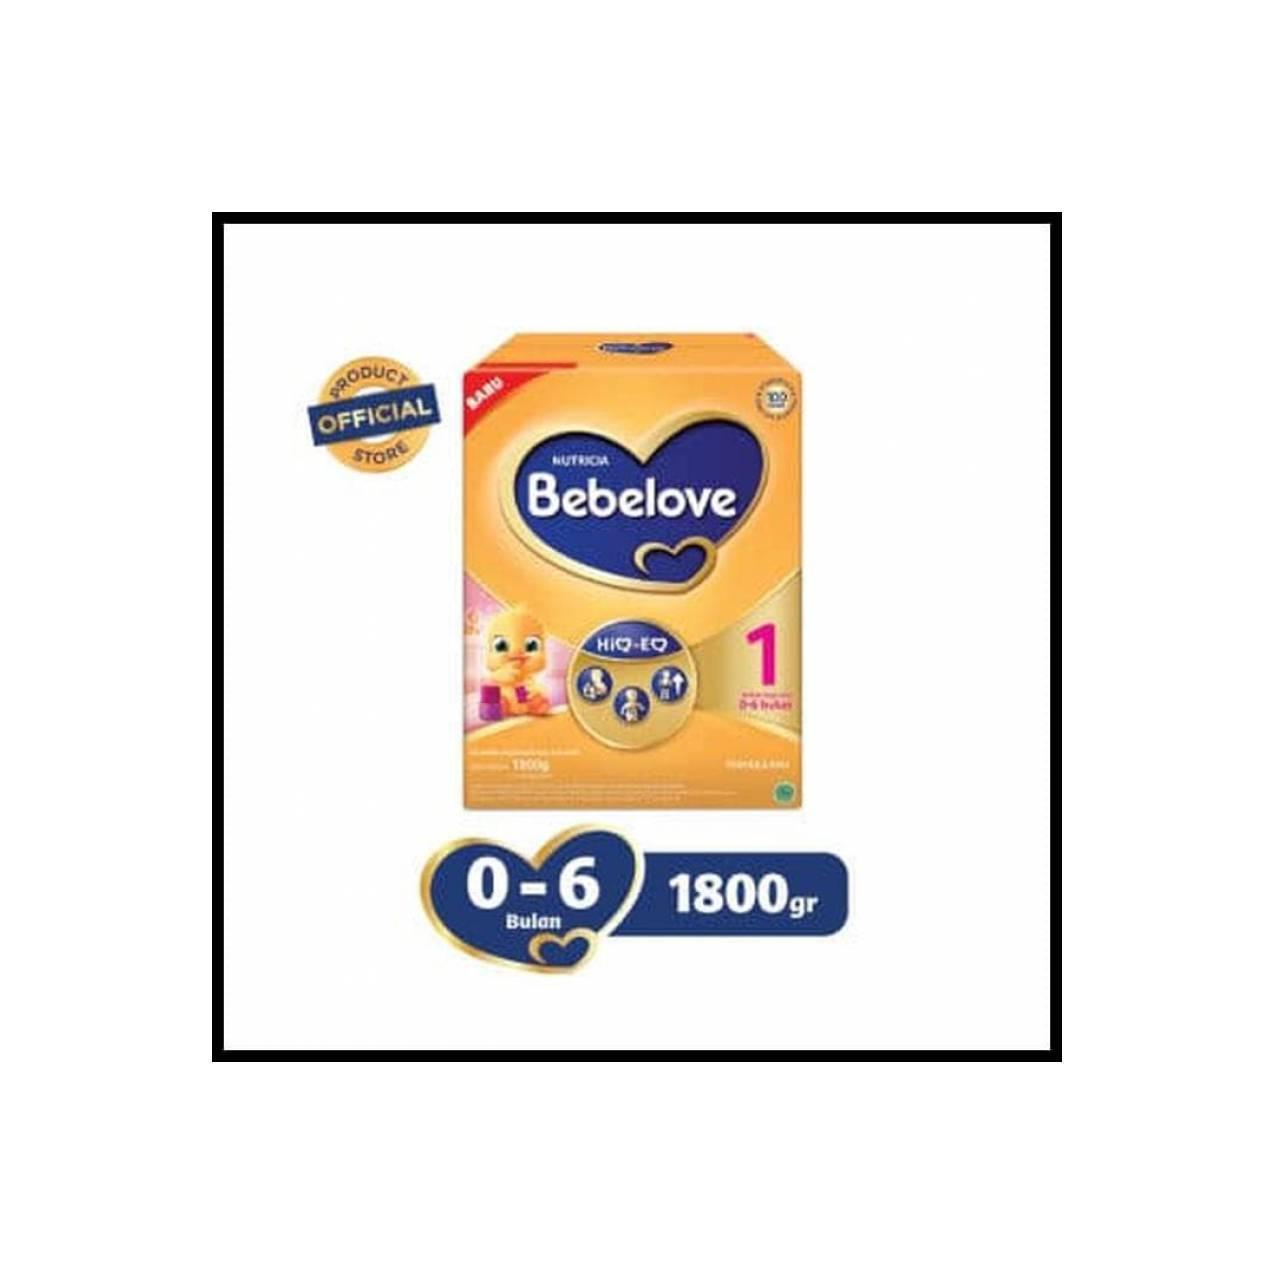 Buy Sell Cheapest Bebelove 2 1800 Best Quality Product Deals Gram Terbaru 1 1800gr